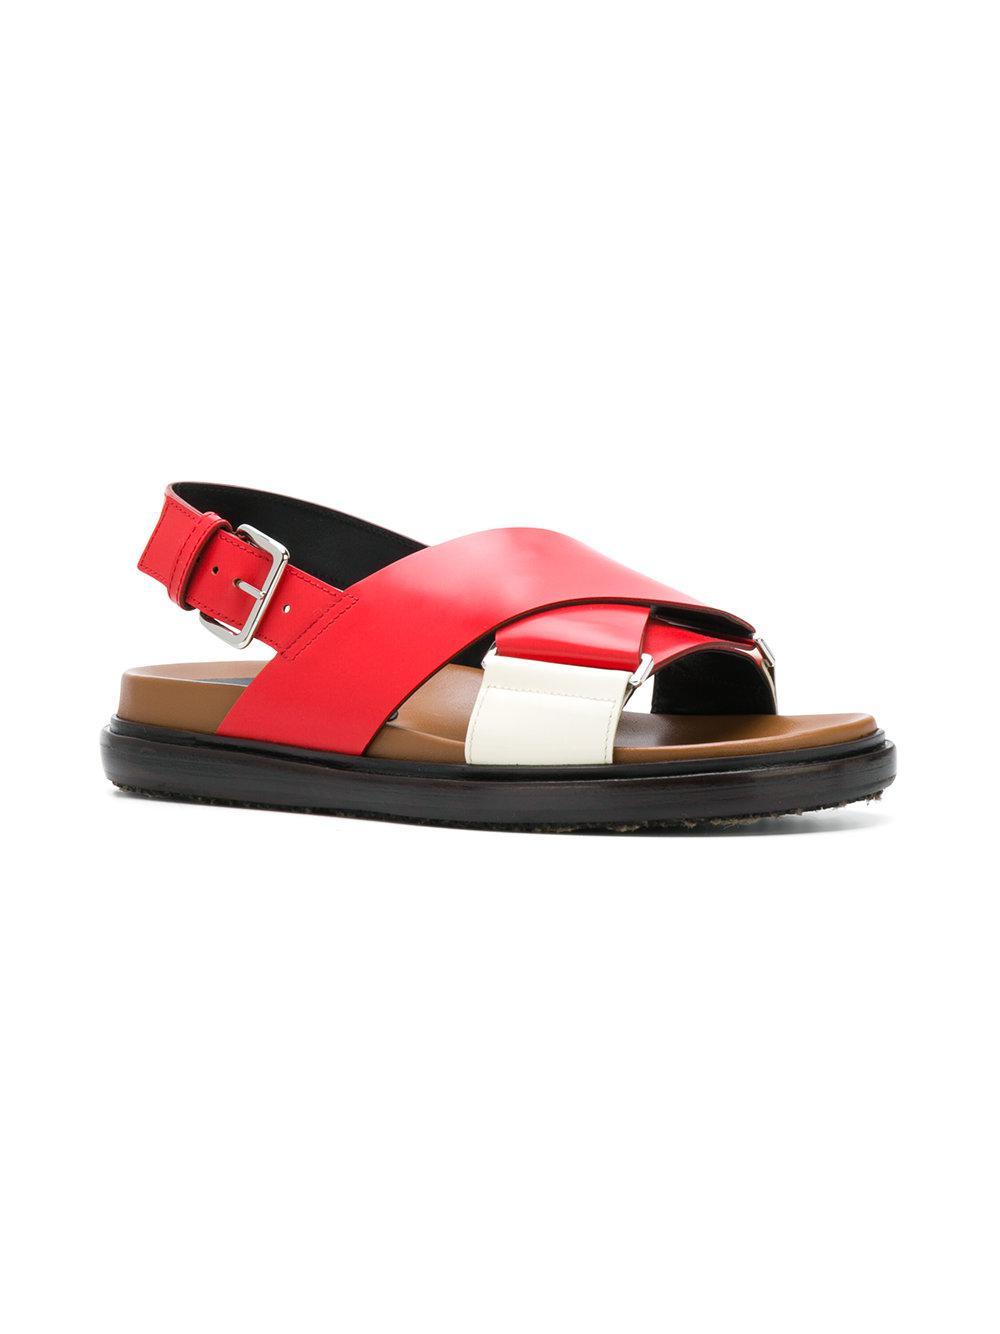 4dae3e82141 Lyst - Marni Criss-cross Fussbett Sandals in Red